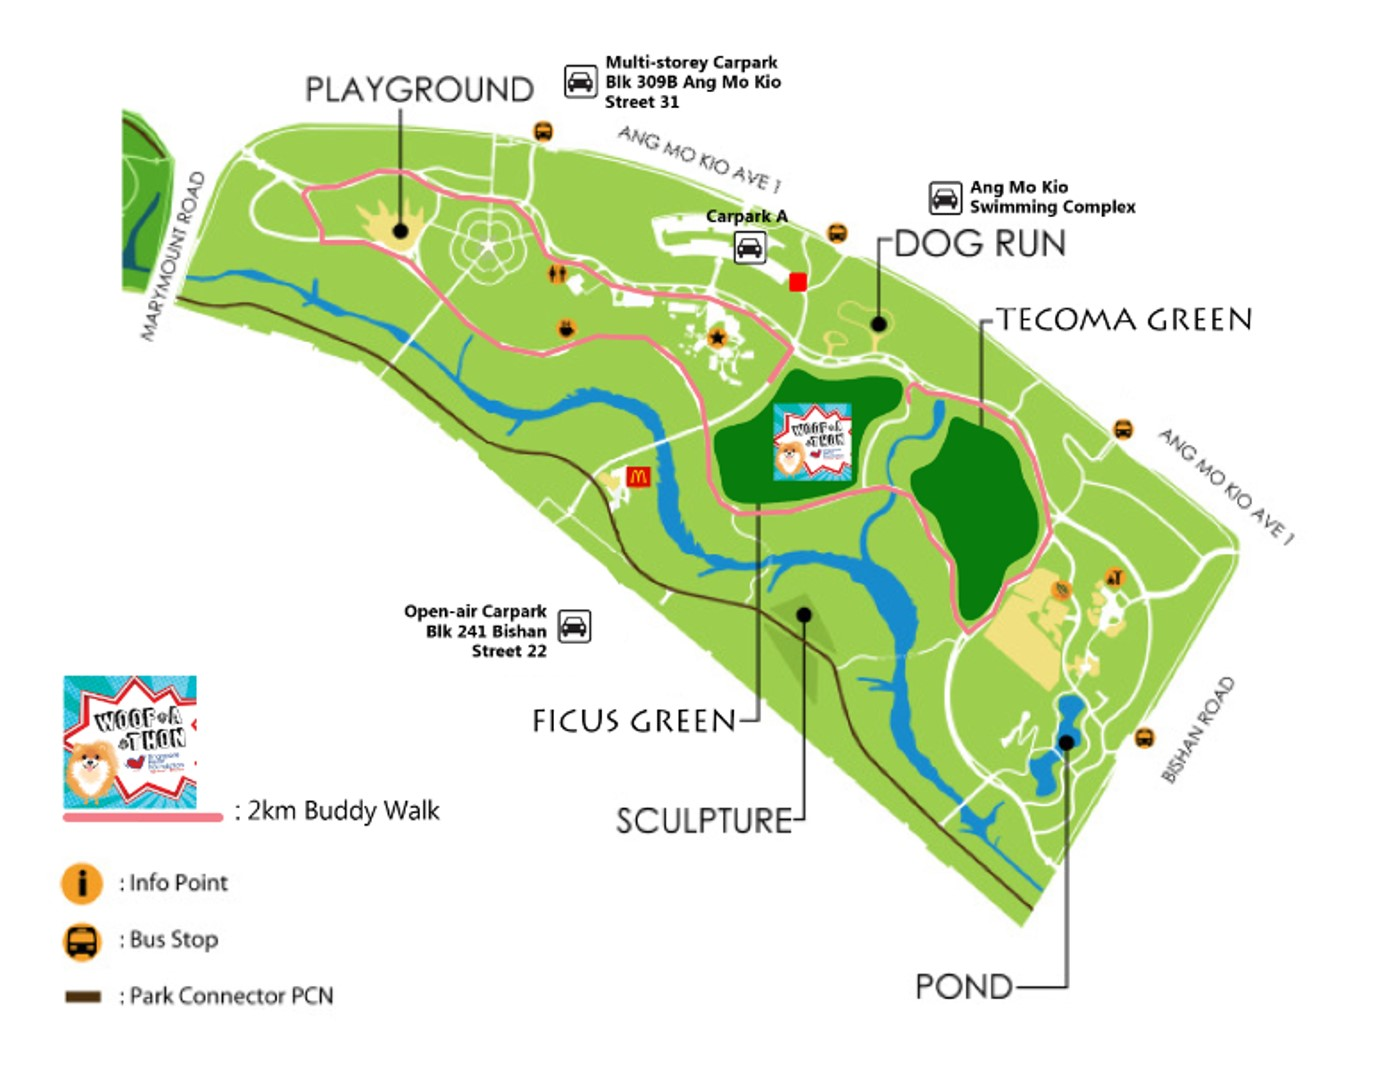 Woof-a-thon 2017 Venue Map